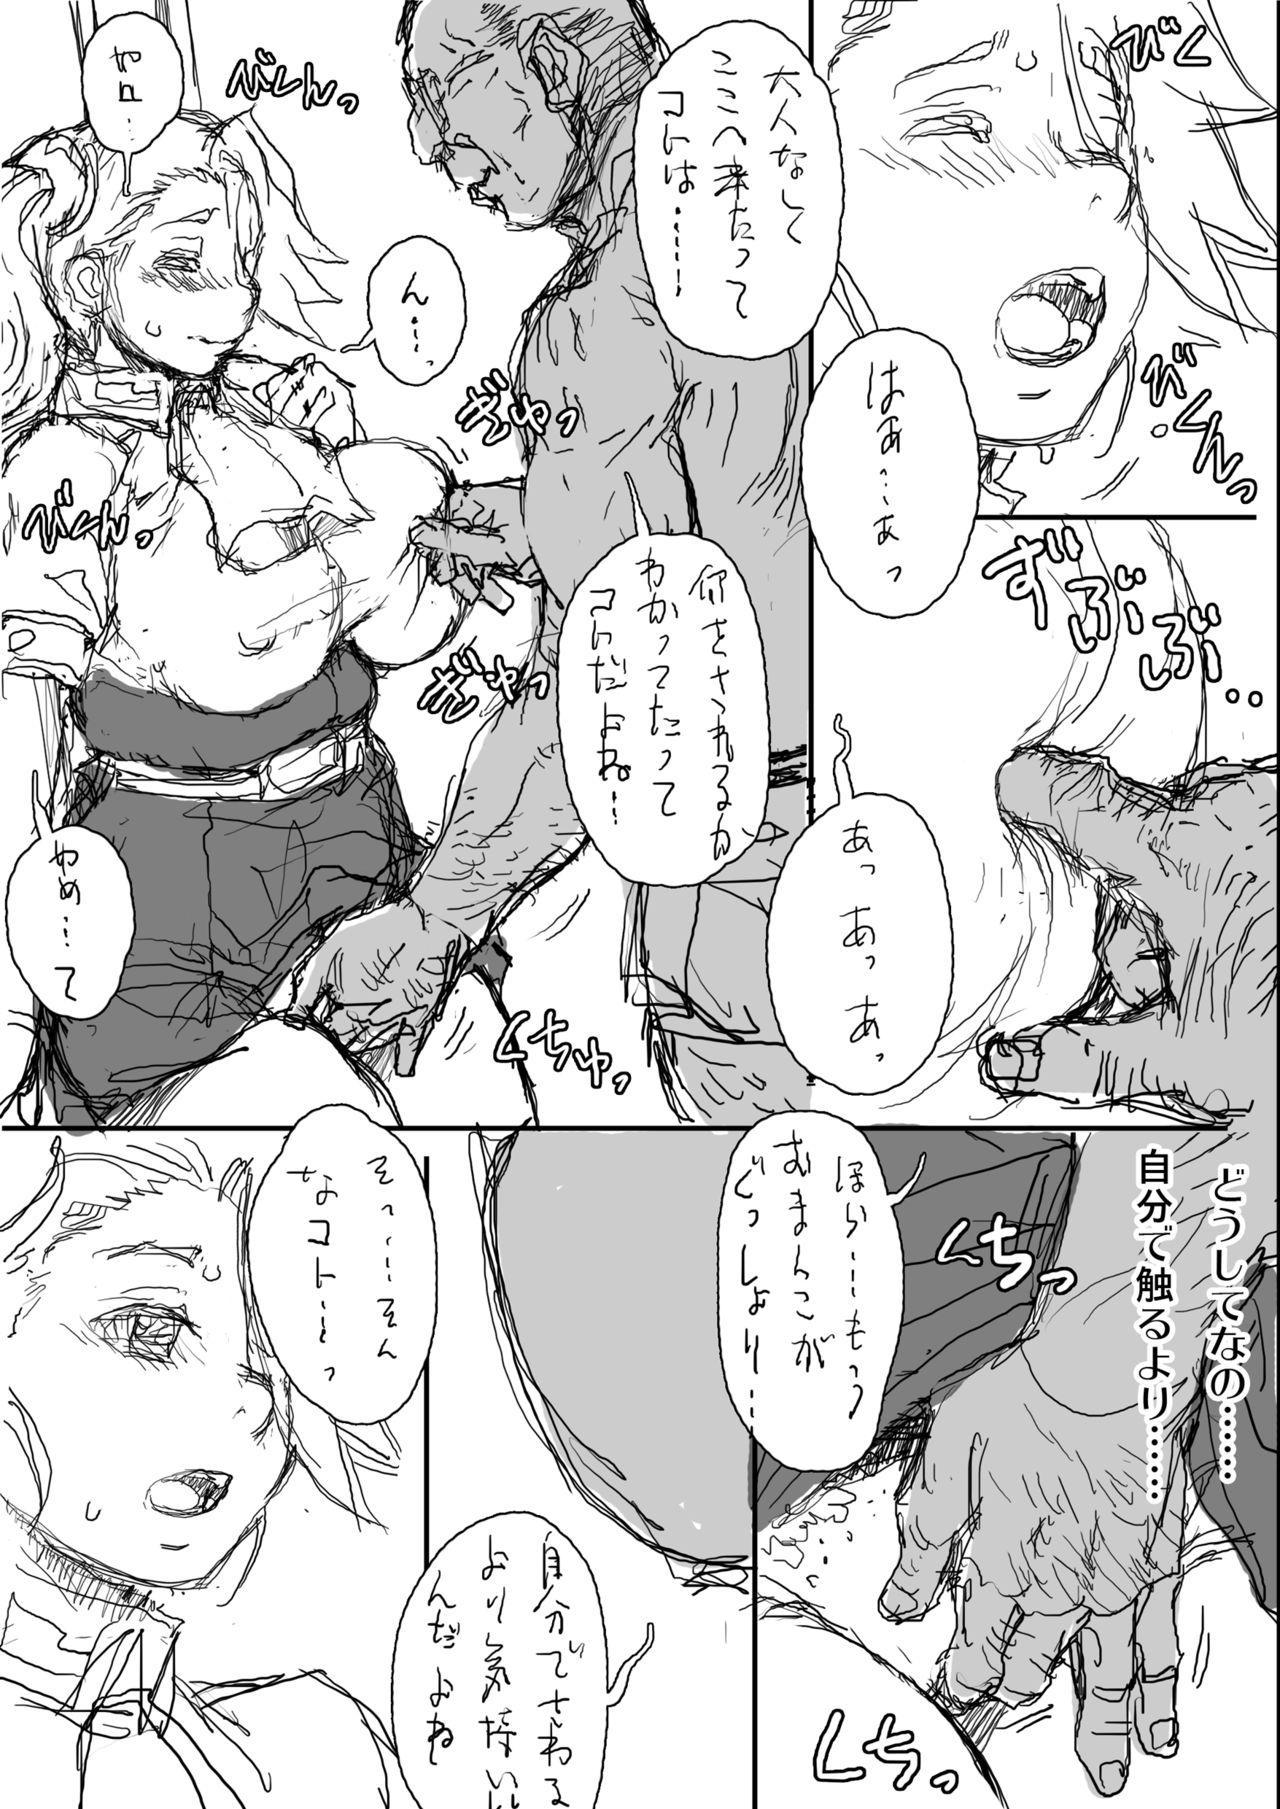 [Studio Tapa Tapa (Sengoku-kun)] Daddy-Long-Legs #3 (Gundam Build Fighters Try) [Digital] 62